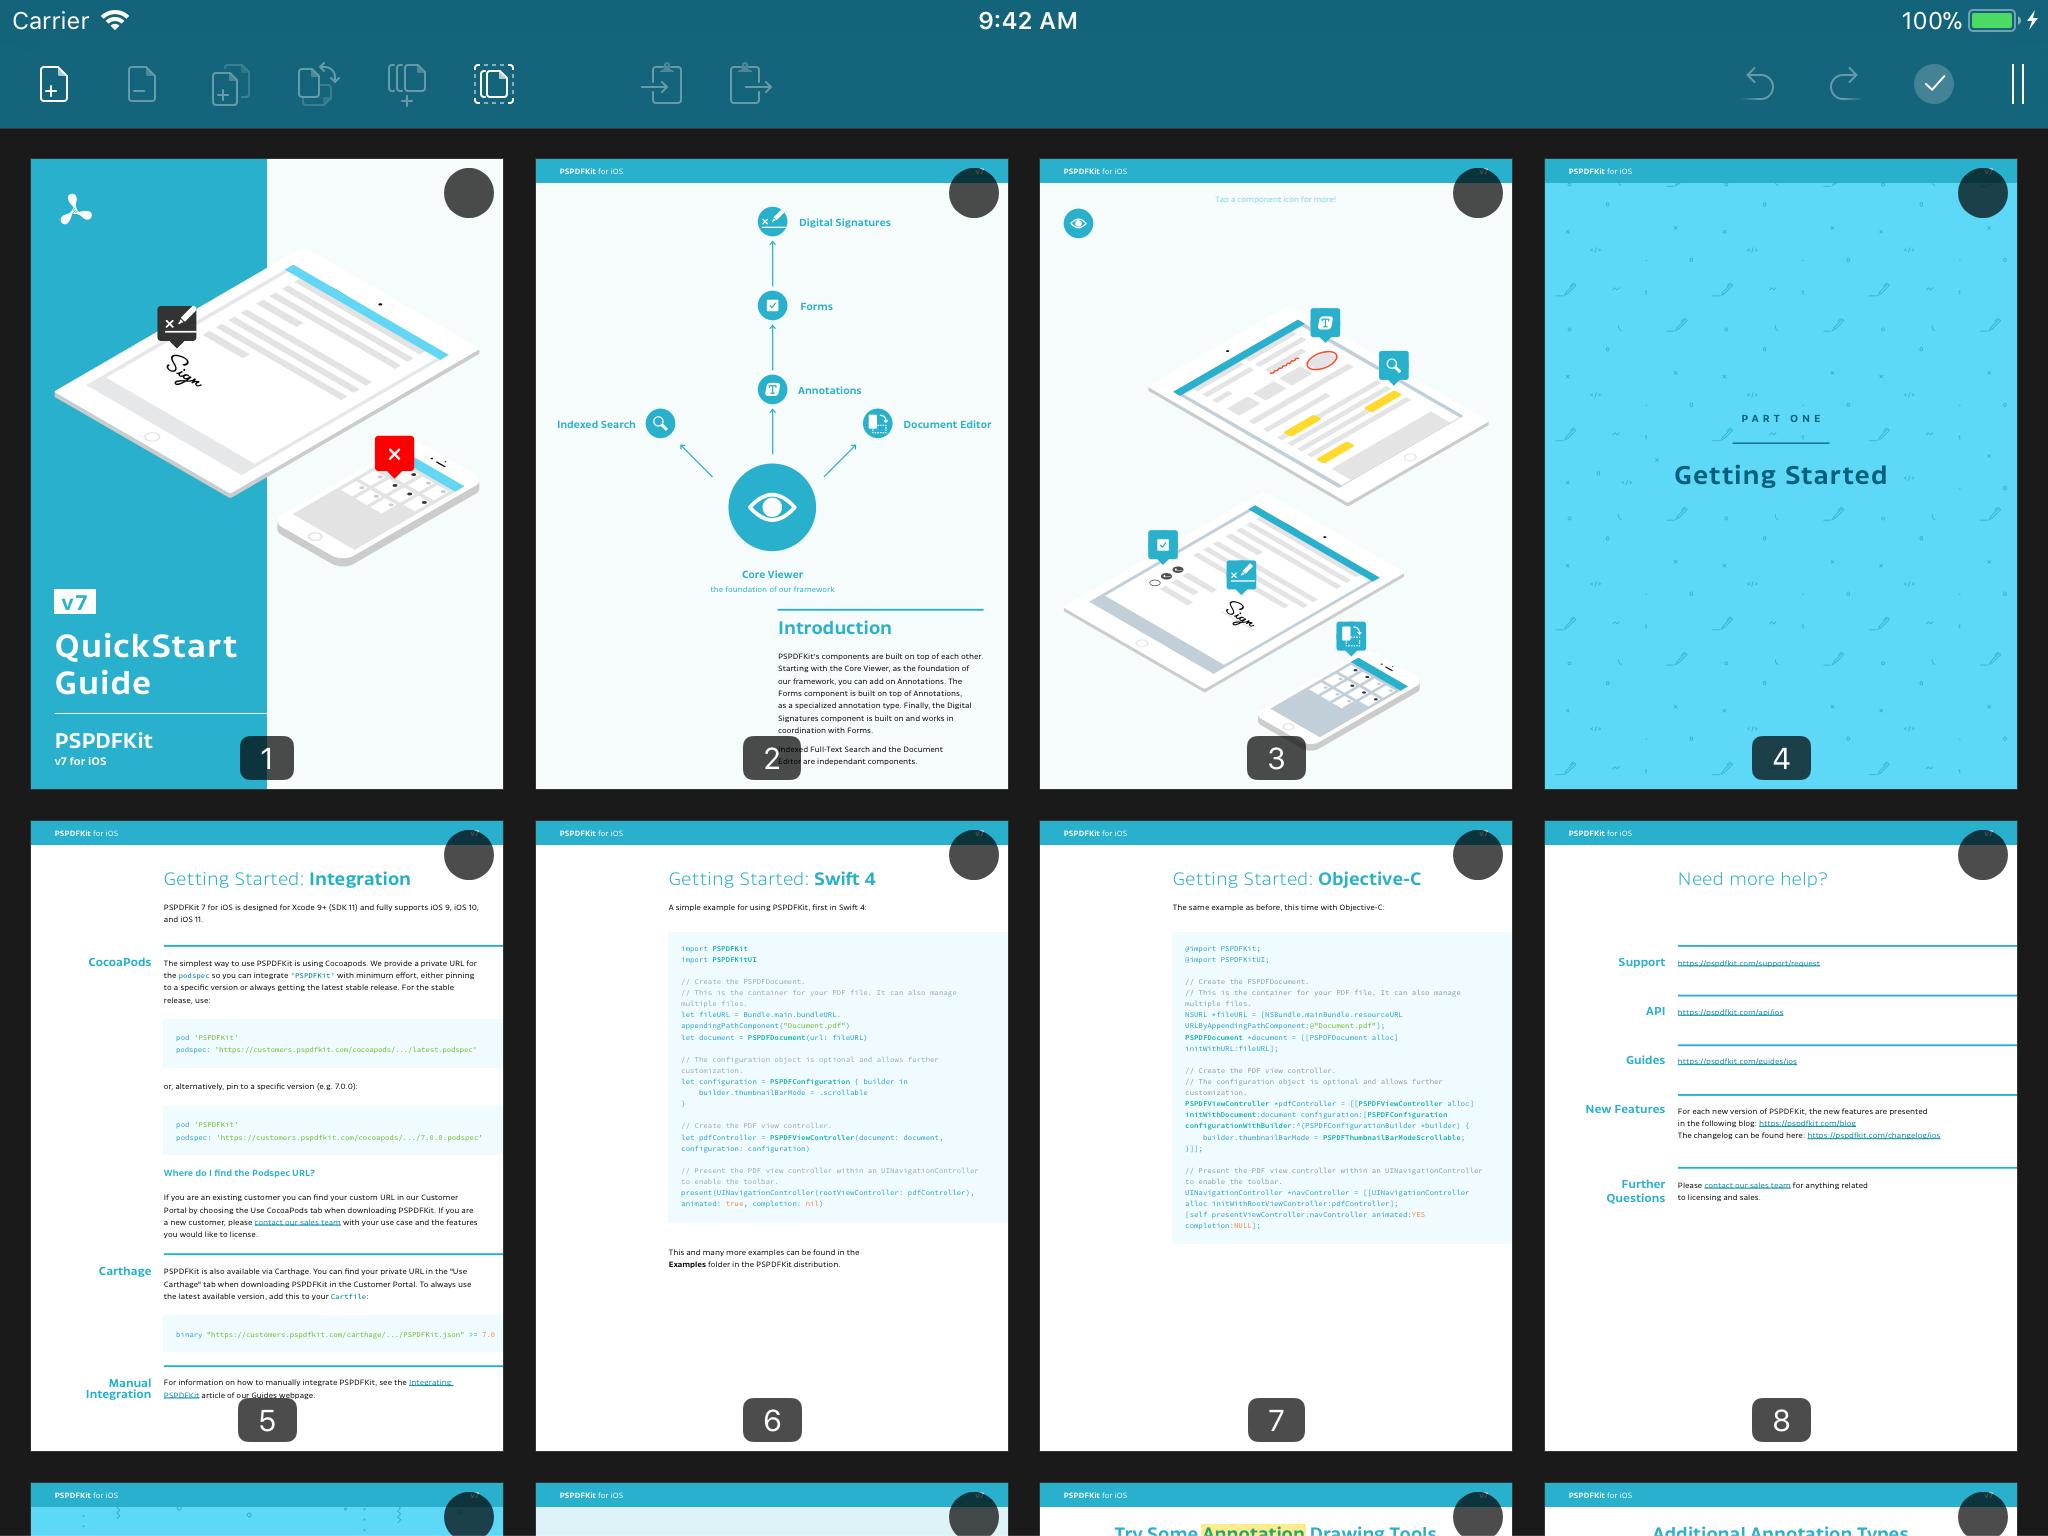 Document Editing UI | PSPDFKit